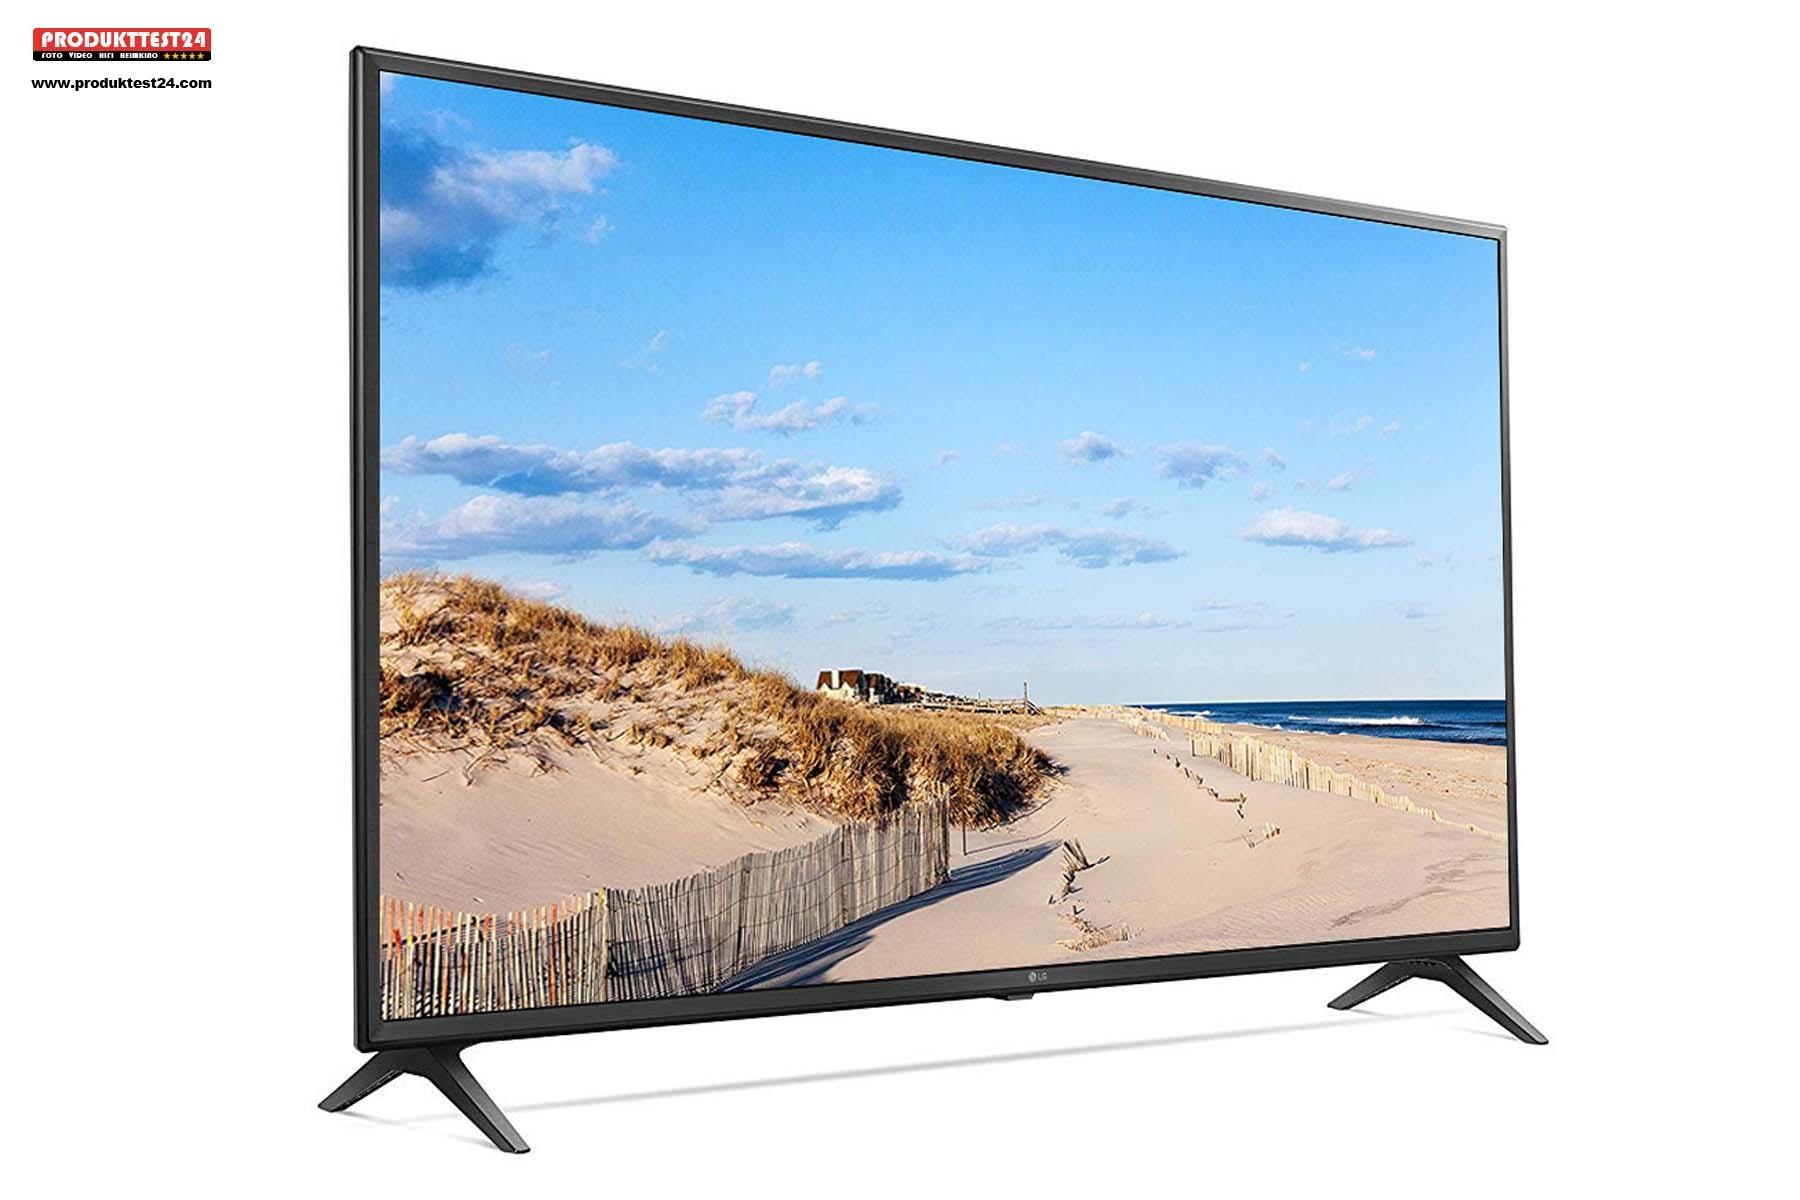 55 Zoll Bilddiagonale mit echter Ultra HD 4K Auflösung